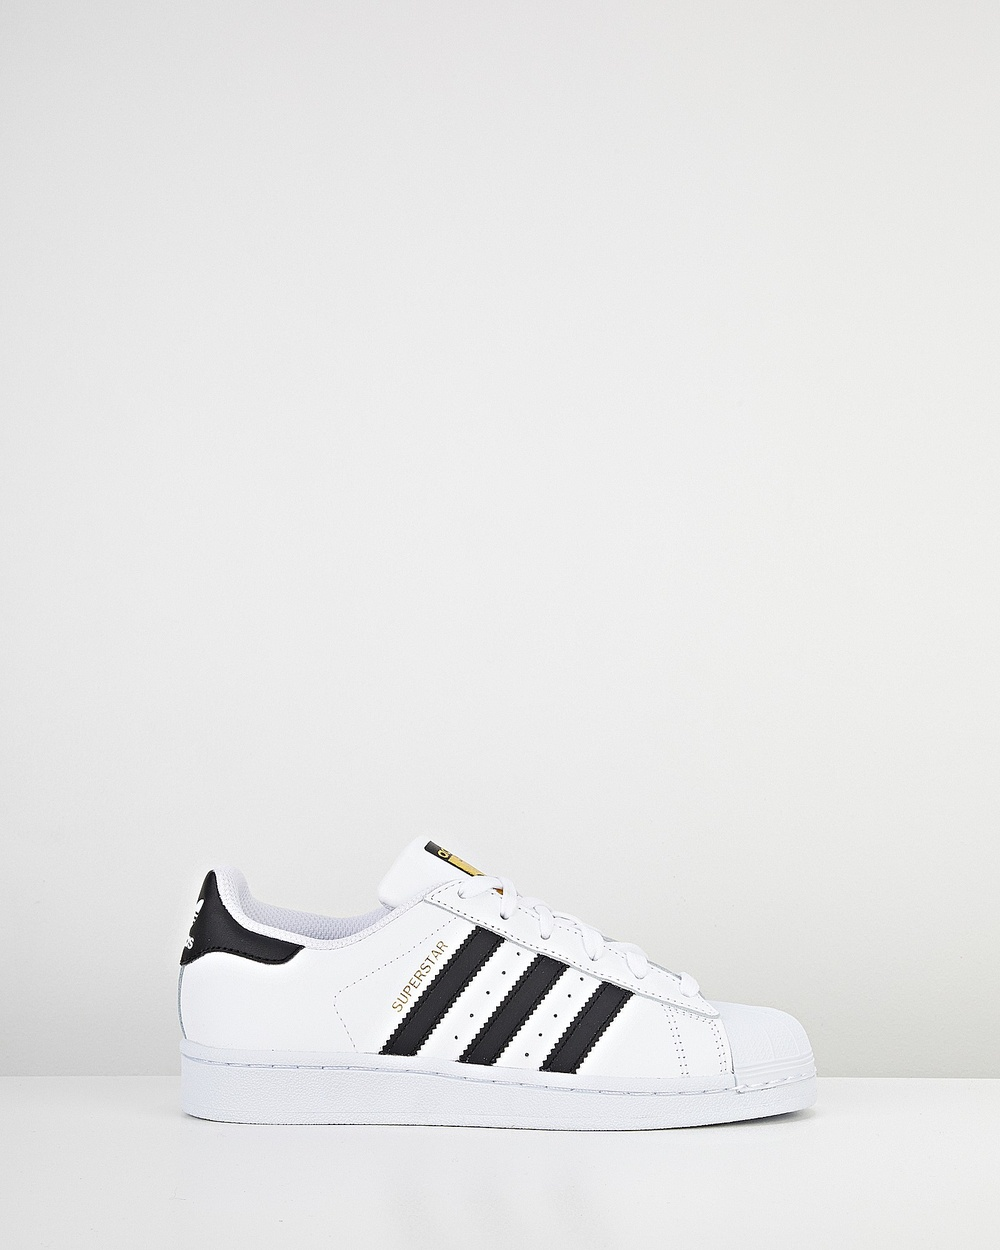 adidas Originals Superstar Foundation Grade School Lifestyle Shoes White/Black